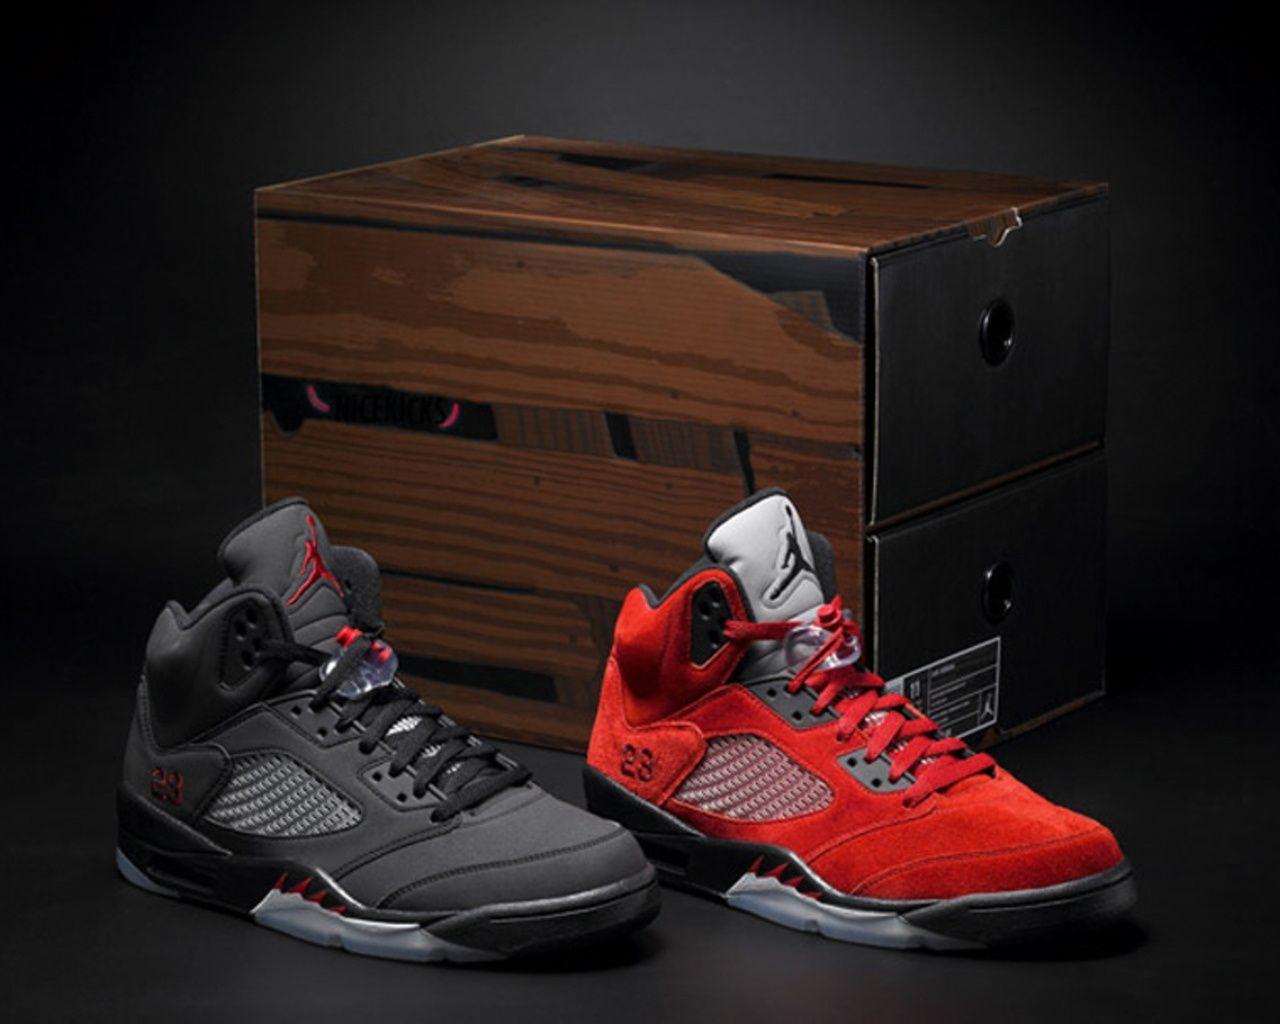 more photos 236f7 d8e83 Air Jordan 5 in 1280x1024 resolution - HD Desktop Wallpapers